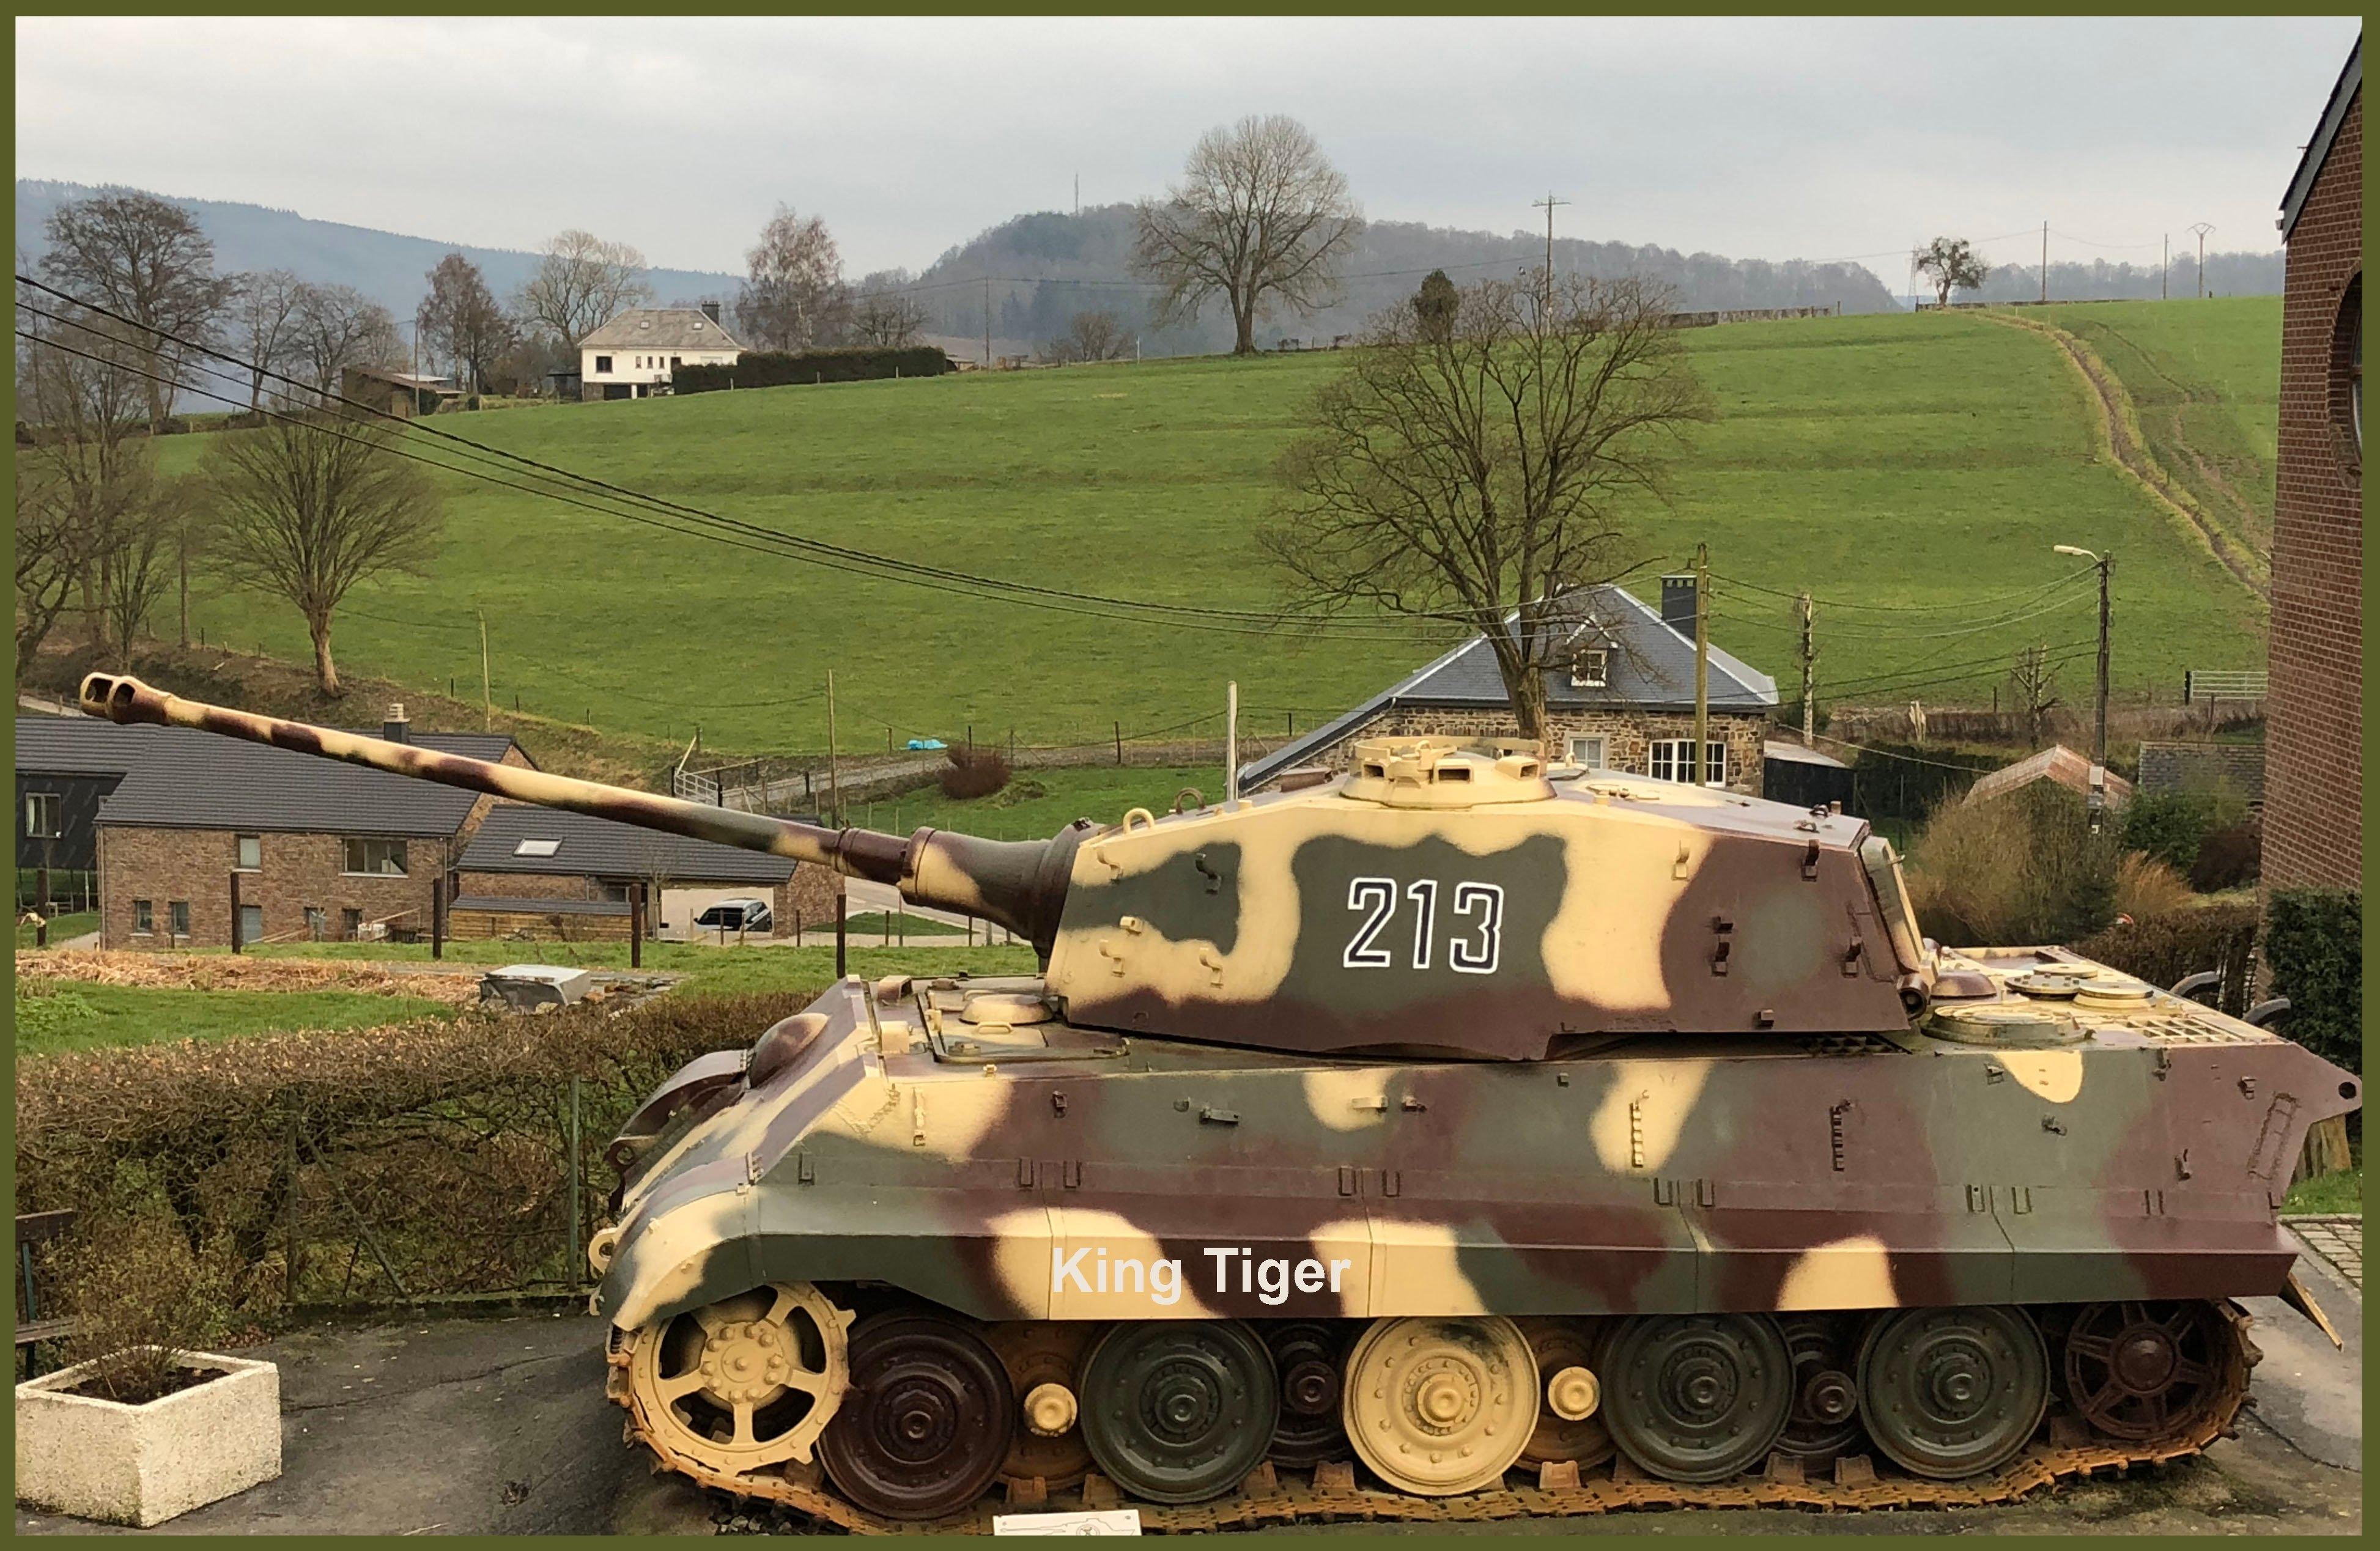 Tiger tank from church